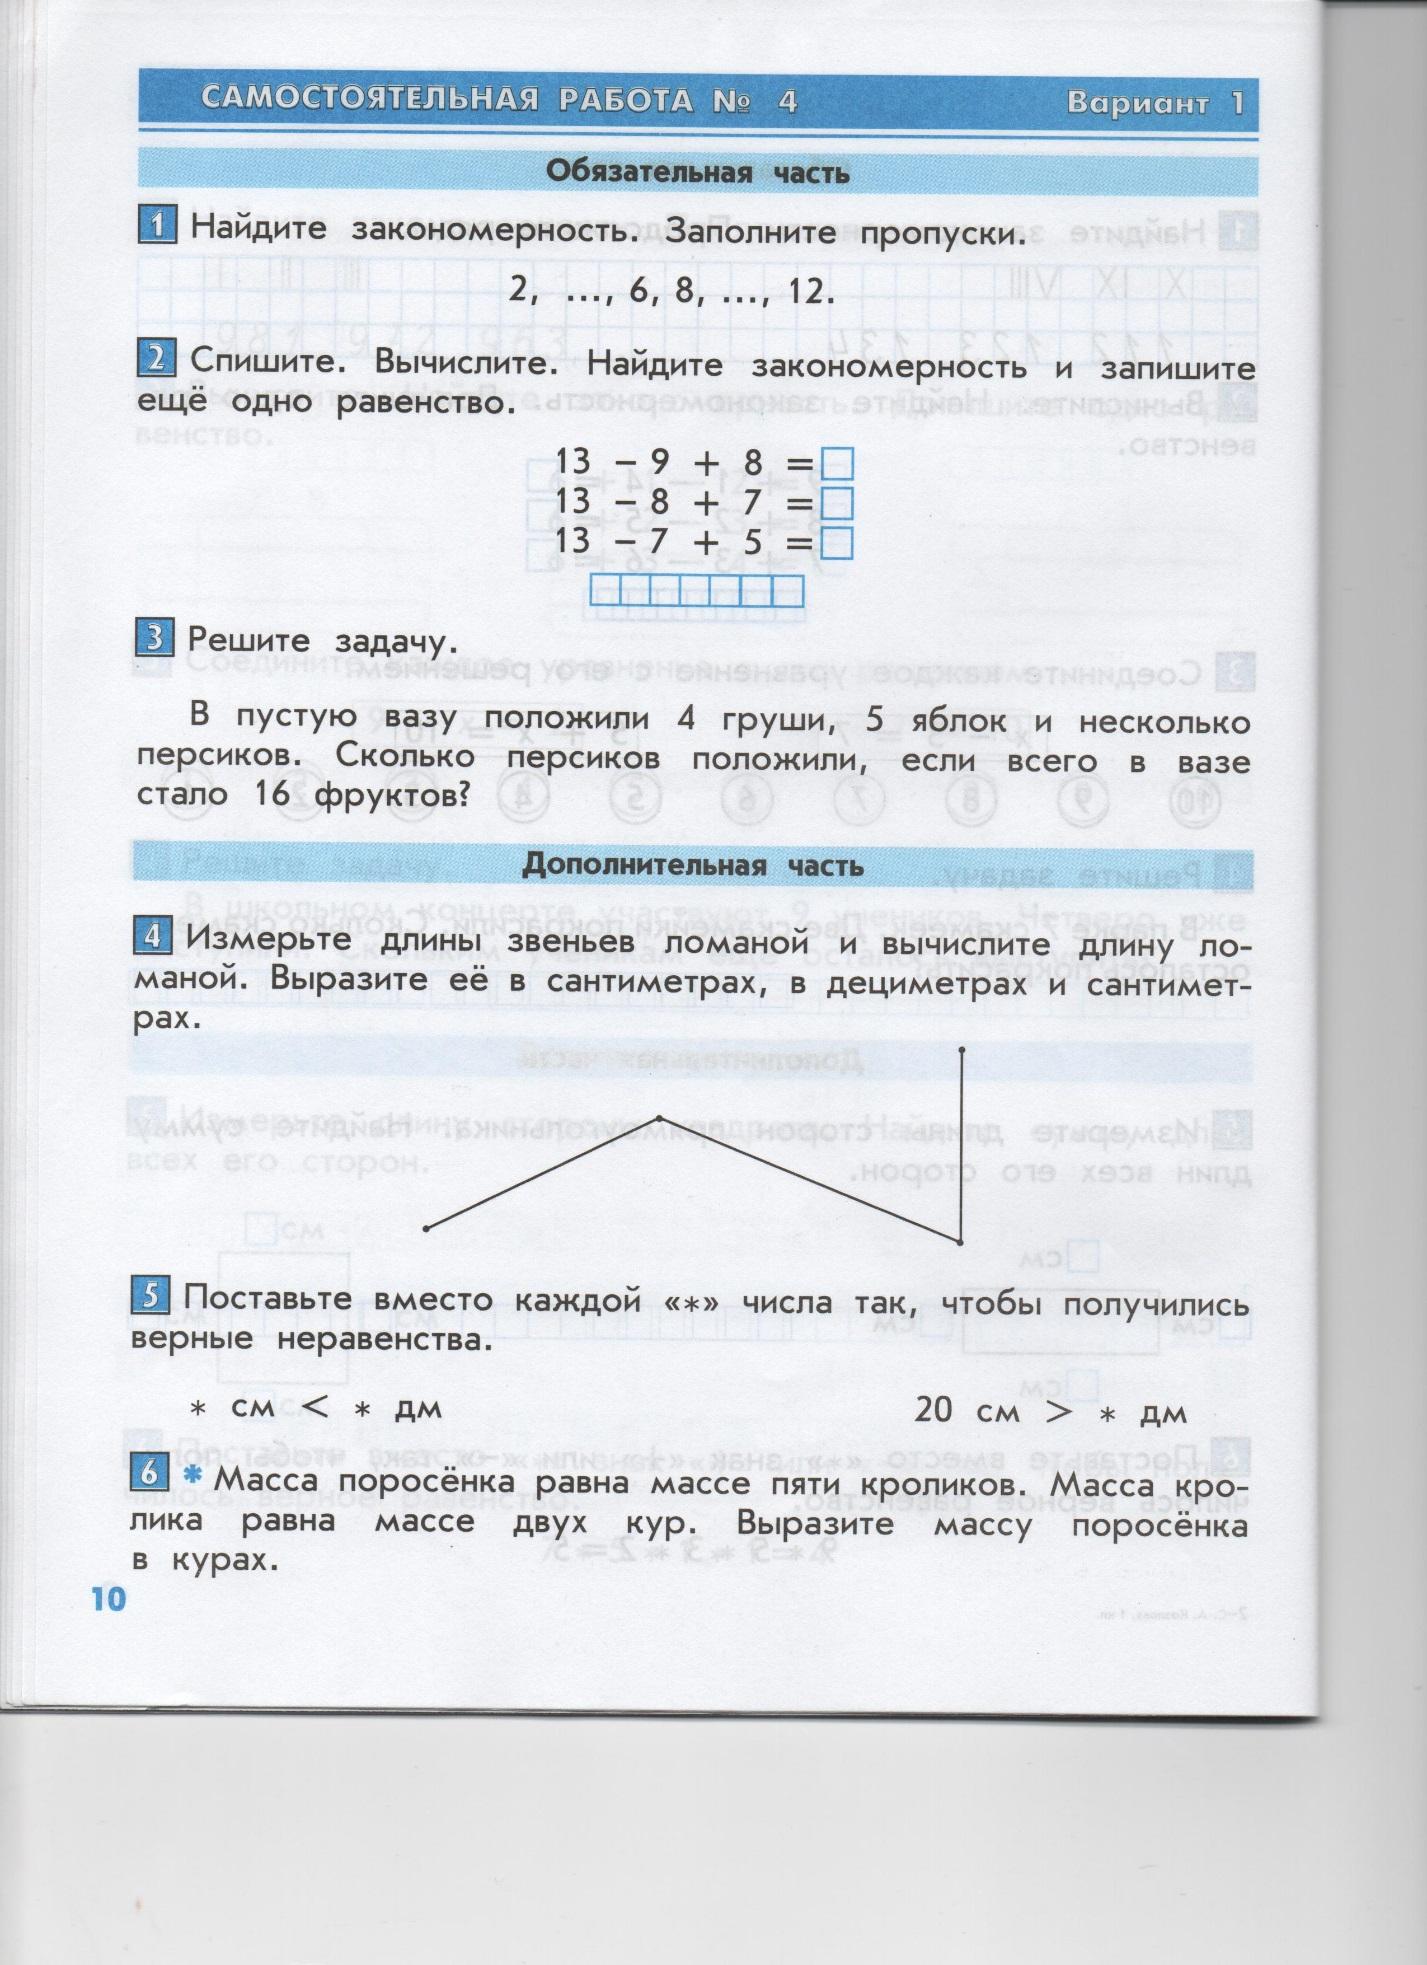 F:\Самост. по МАТЕМ. И окр.миру (СКАНЕР)\Математика\1 013.jpg